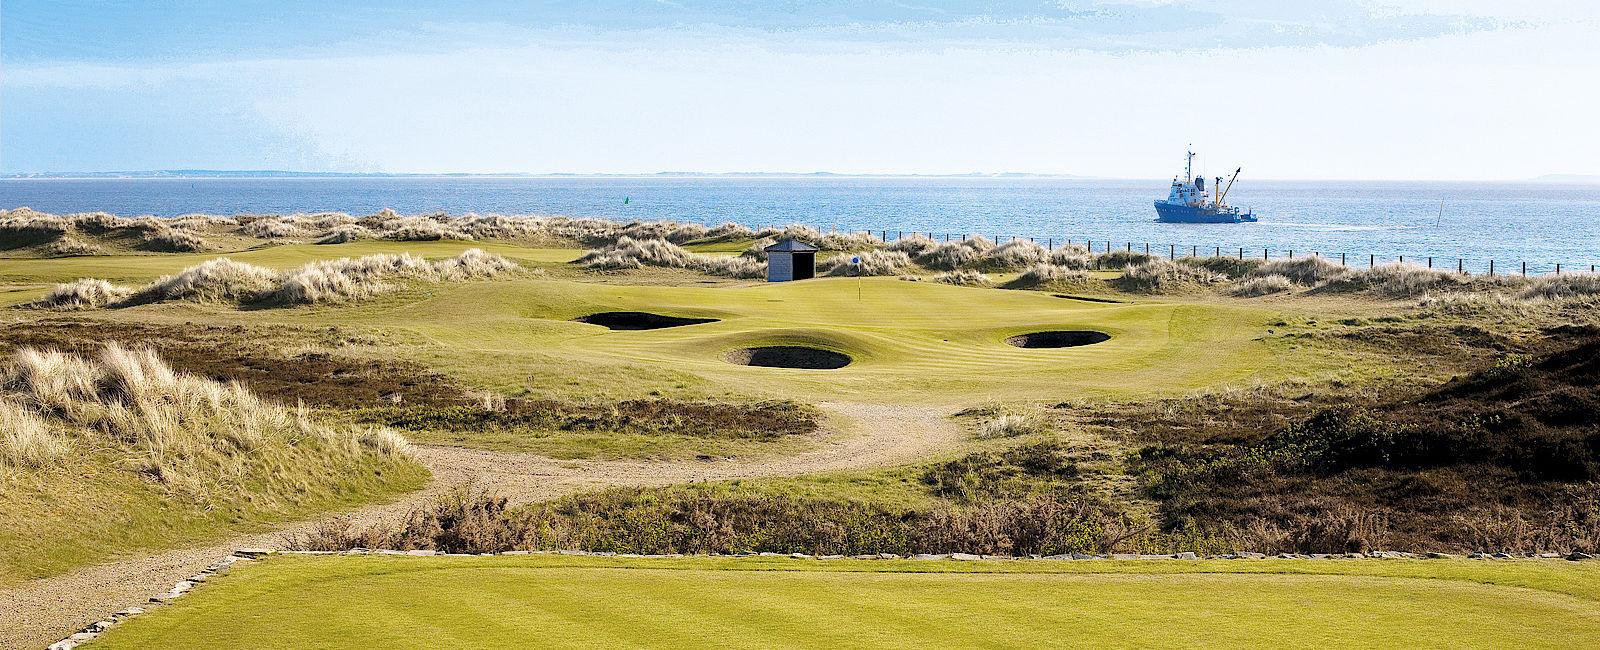 Budersand Hotel - Golf & Spa - Sylt - Connoisseur Circle Hoteltest